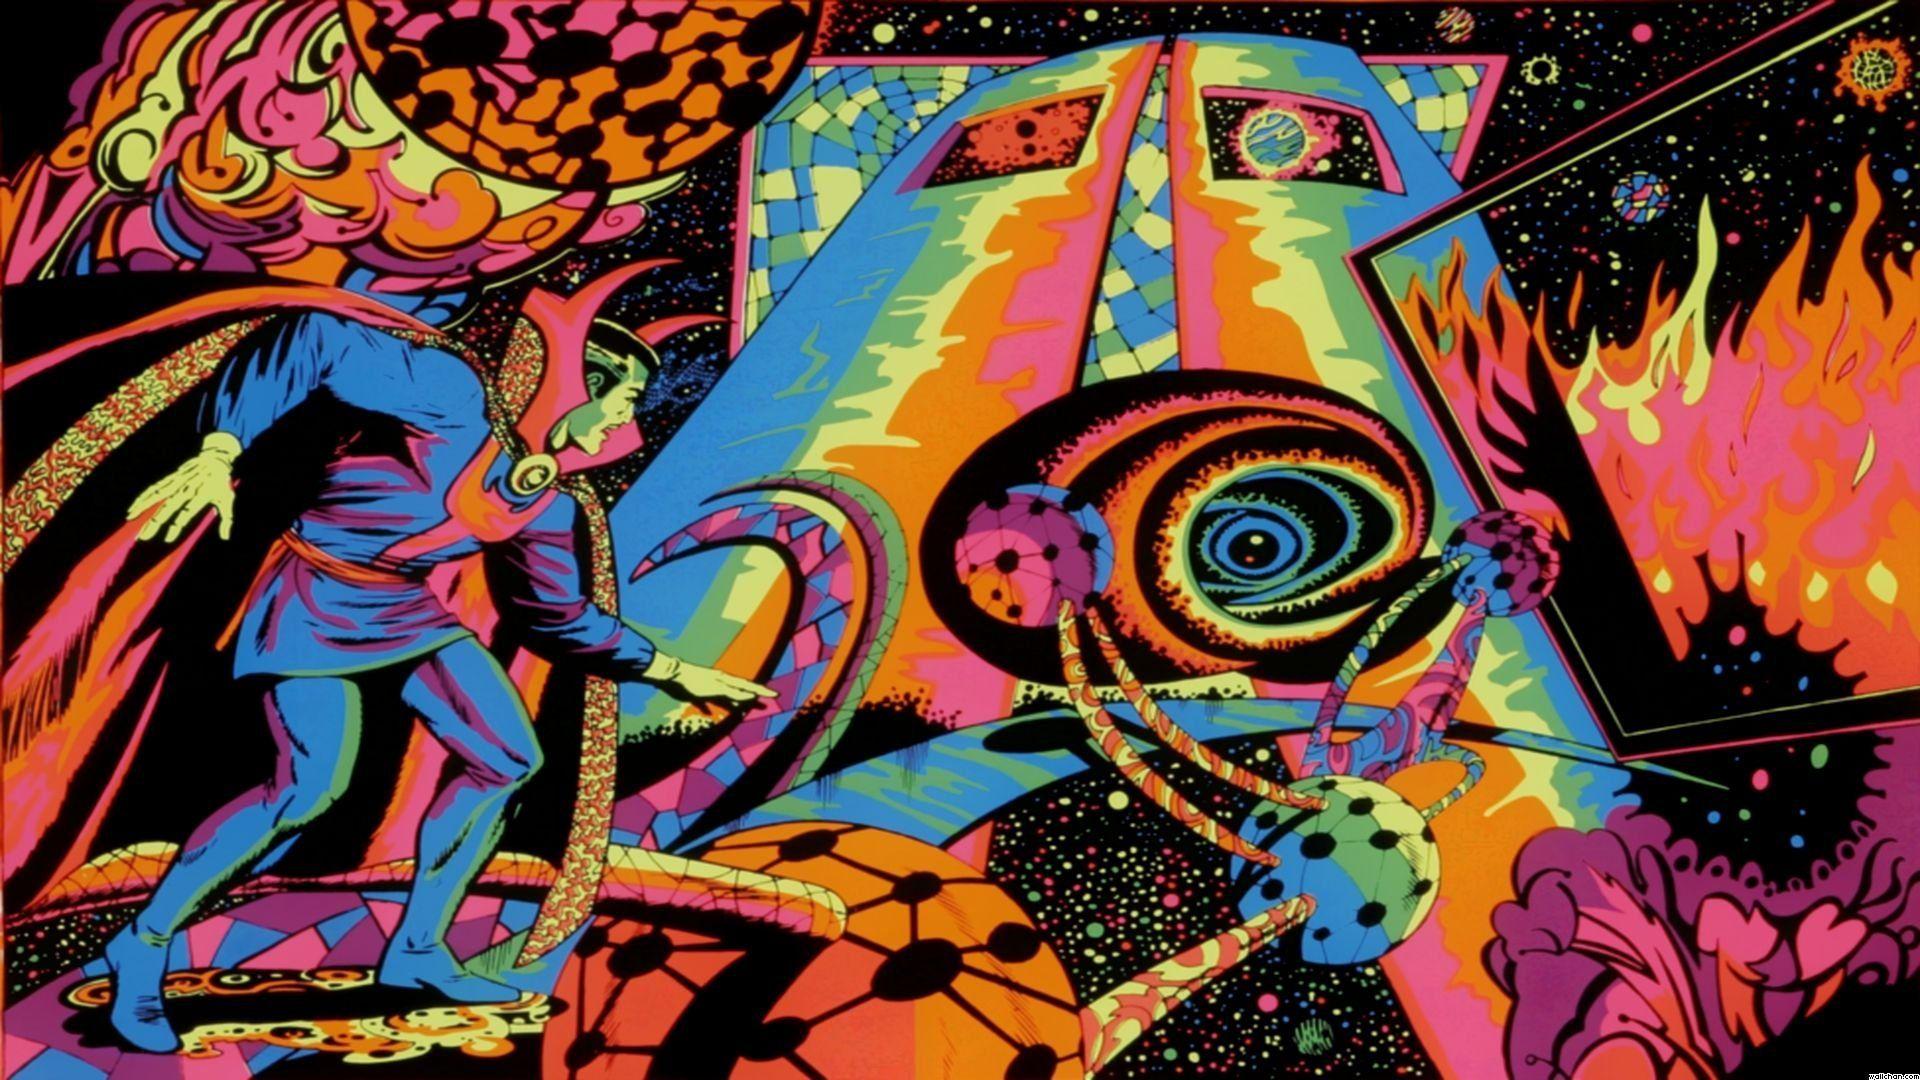 Doctor Strange Wallpaper Desktop Sdeerwallpaper